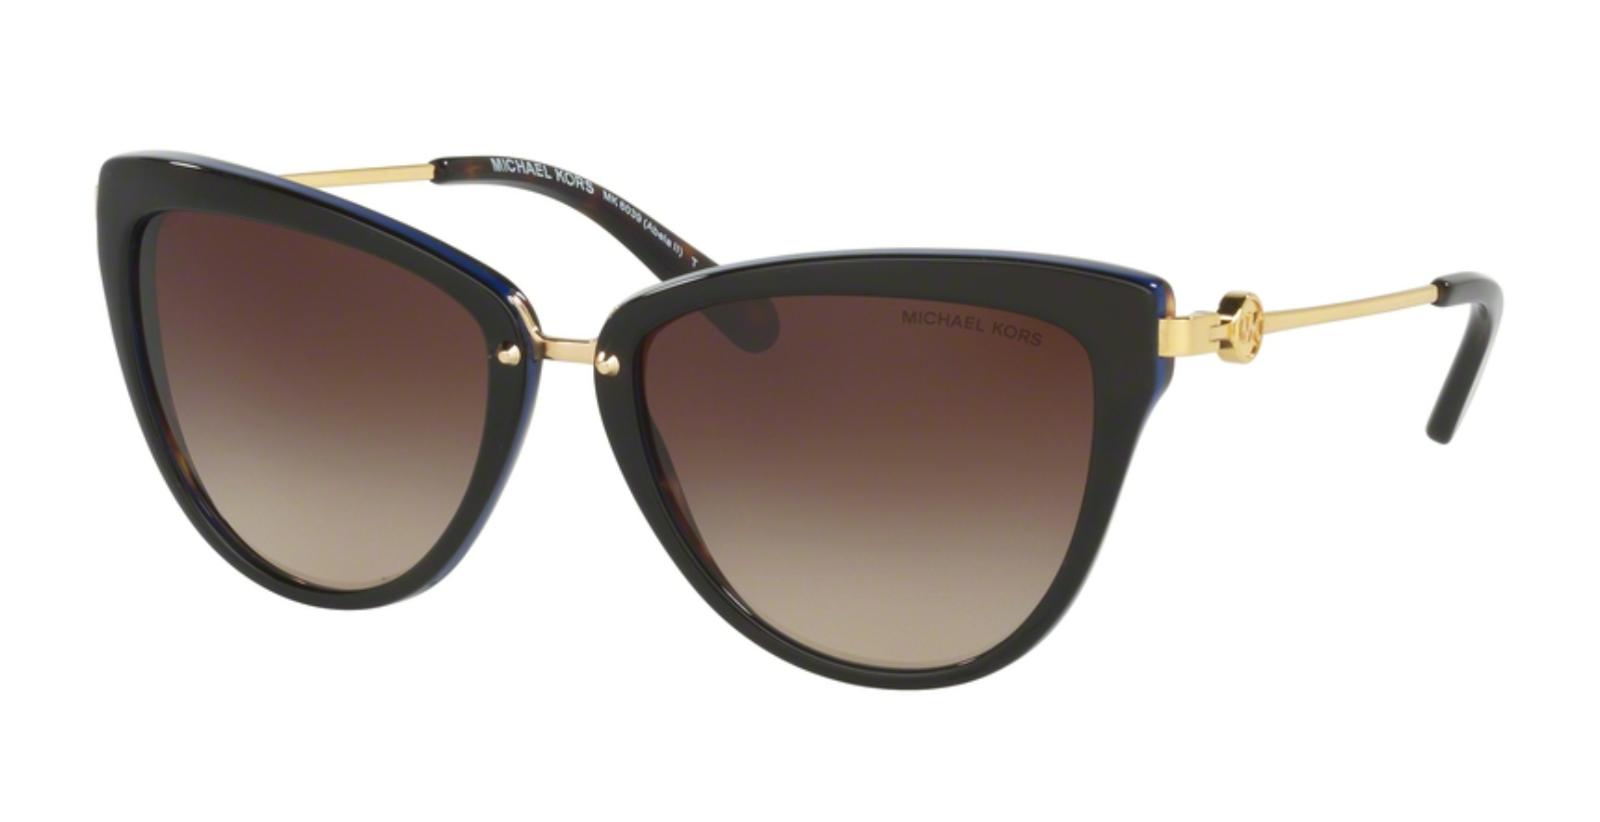 02ee00e2b64d MICHAEL KORS Sunglasses ABELA II MK 6039 314713 Tortoise Blue w/ Smoke  Gradient - $159.99